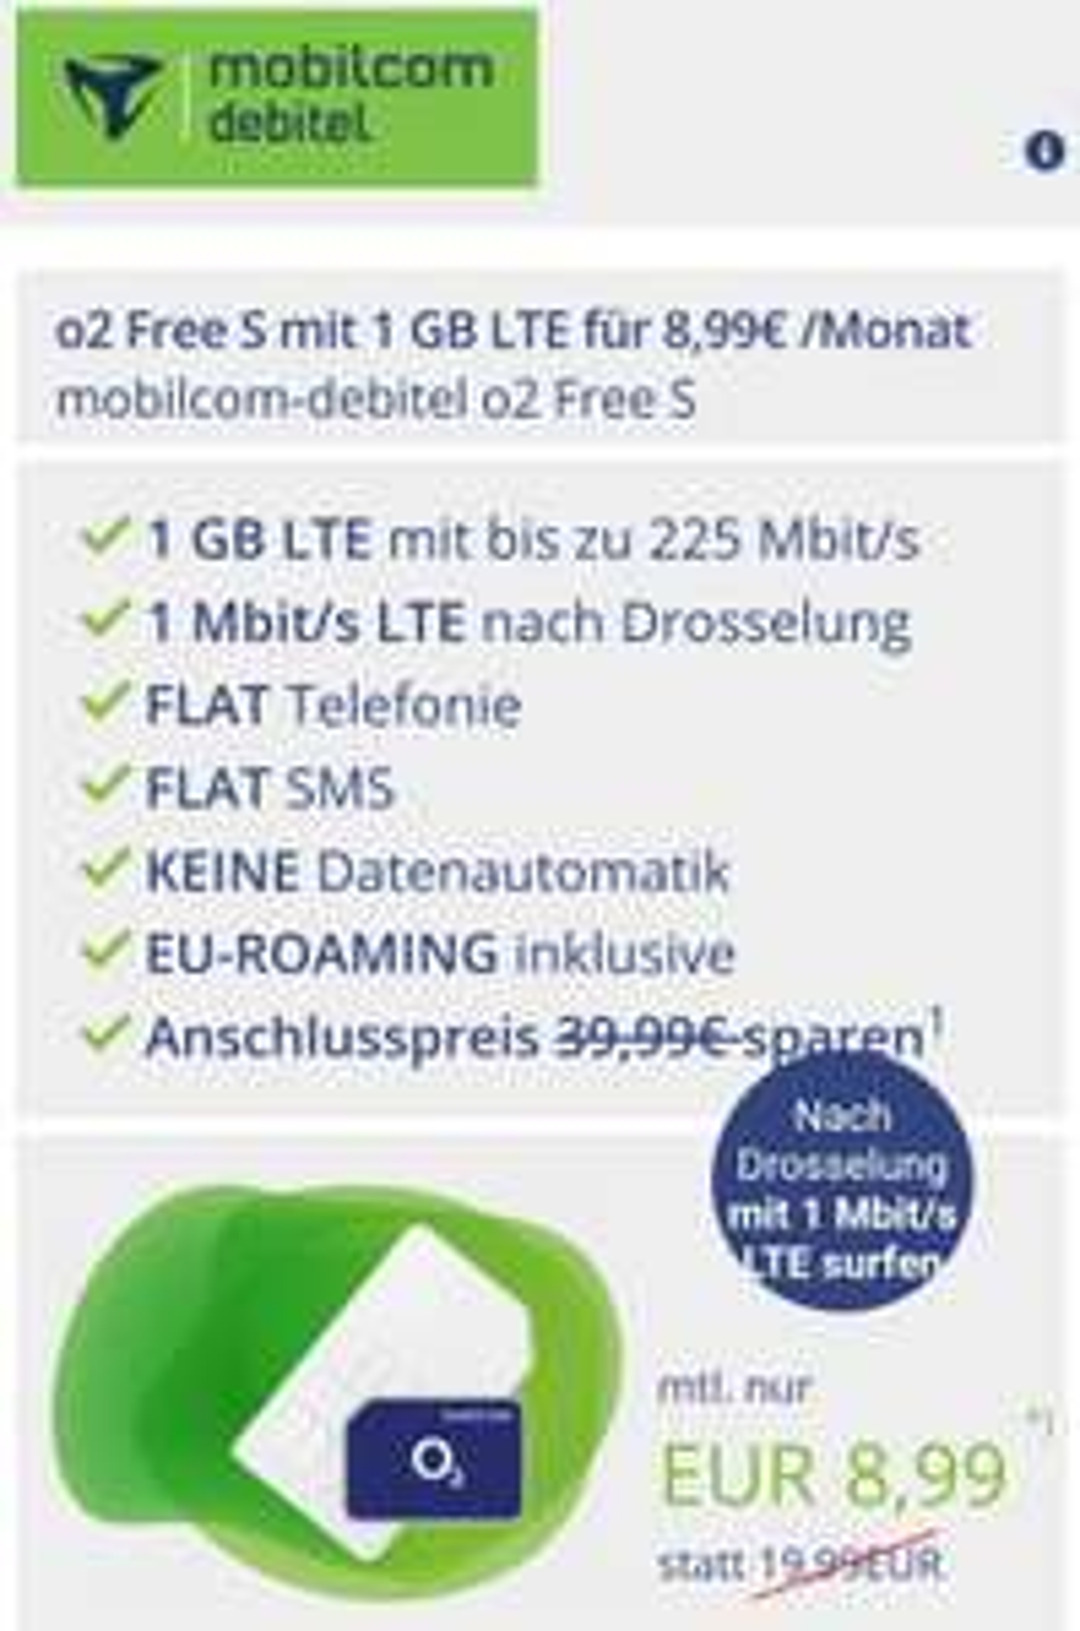 Mobilcom Debitel 1GB LTE Unlimited (1Mbit/s nach Drosselung) + Allnet Flat mtl. 8,99€ (O2 Netz)